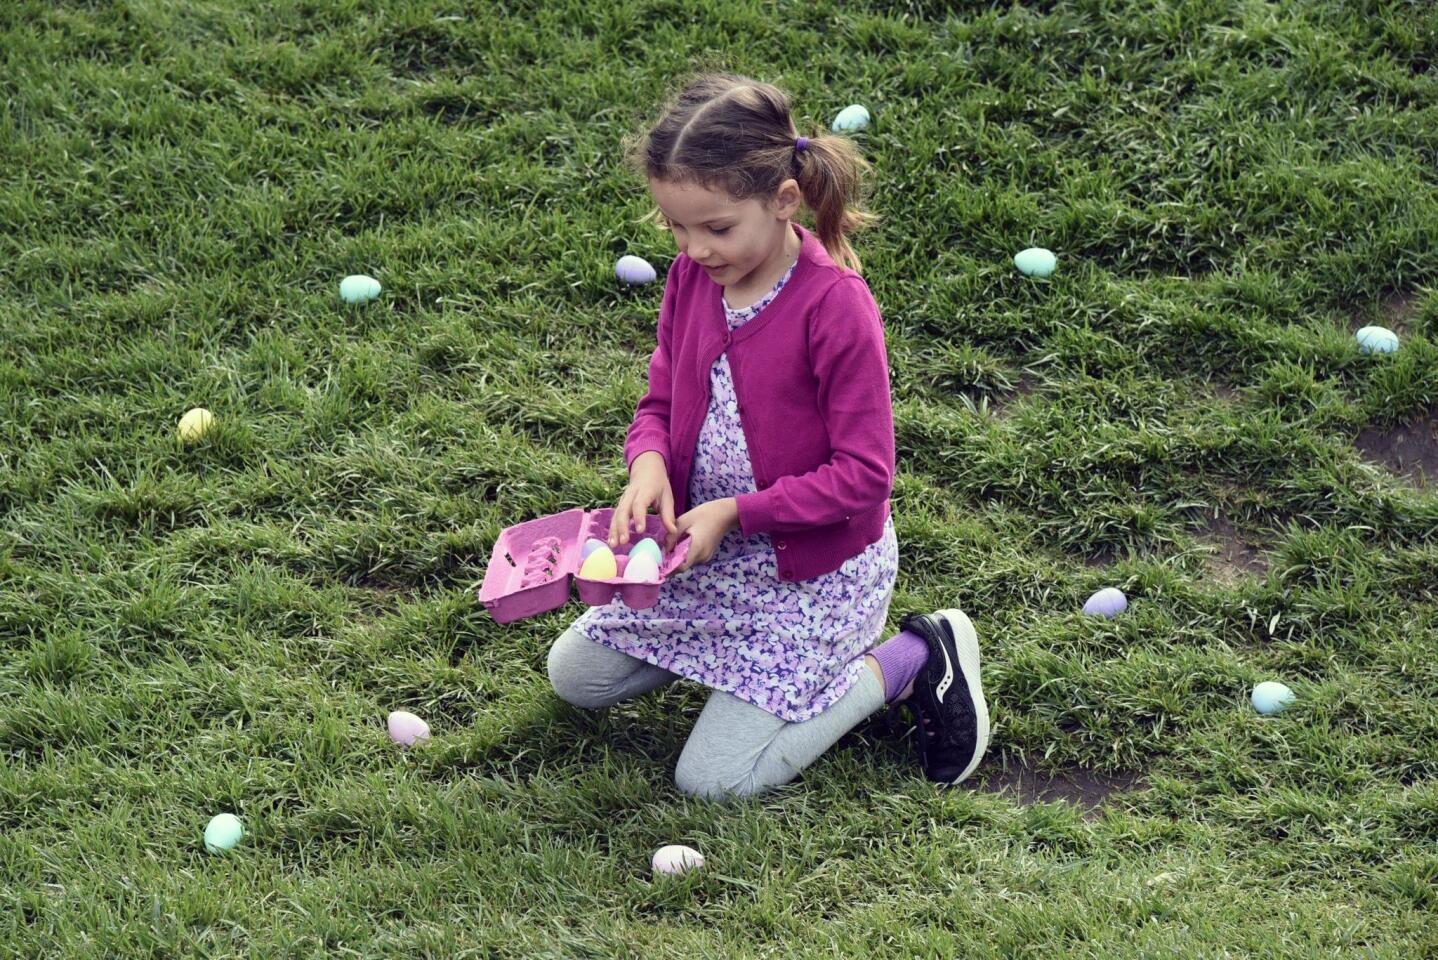 Eggstravaganza at the Village Church